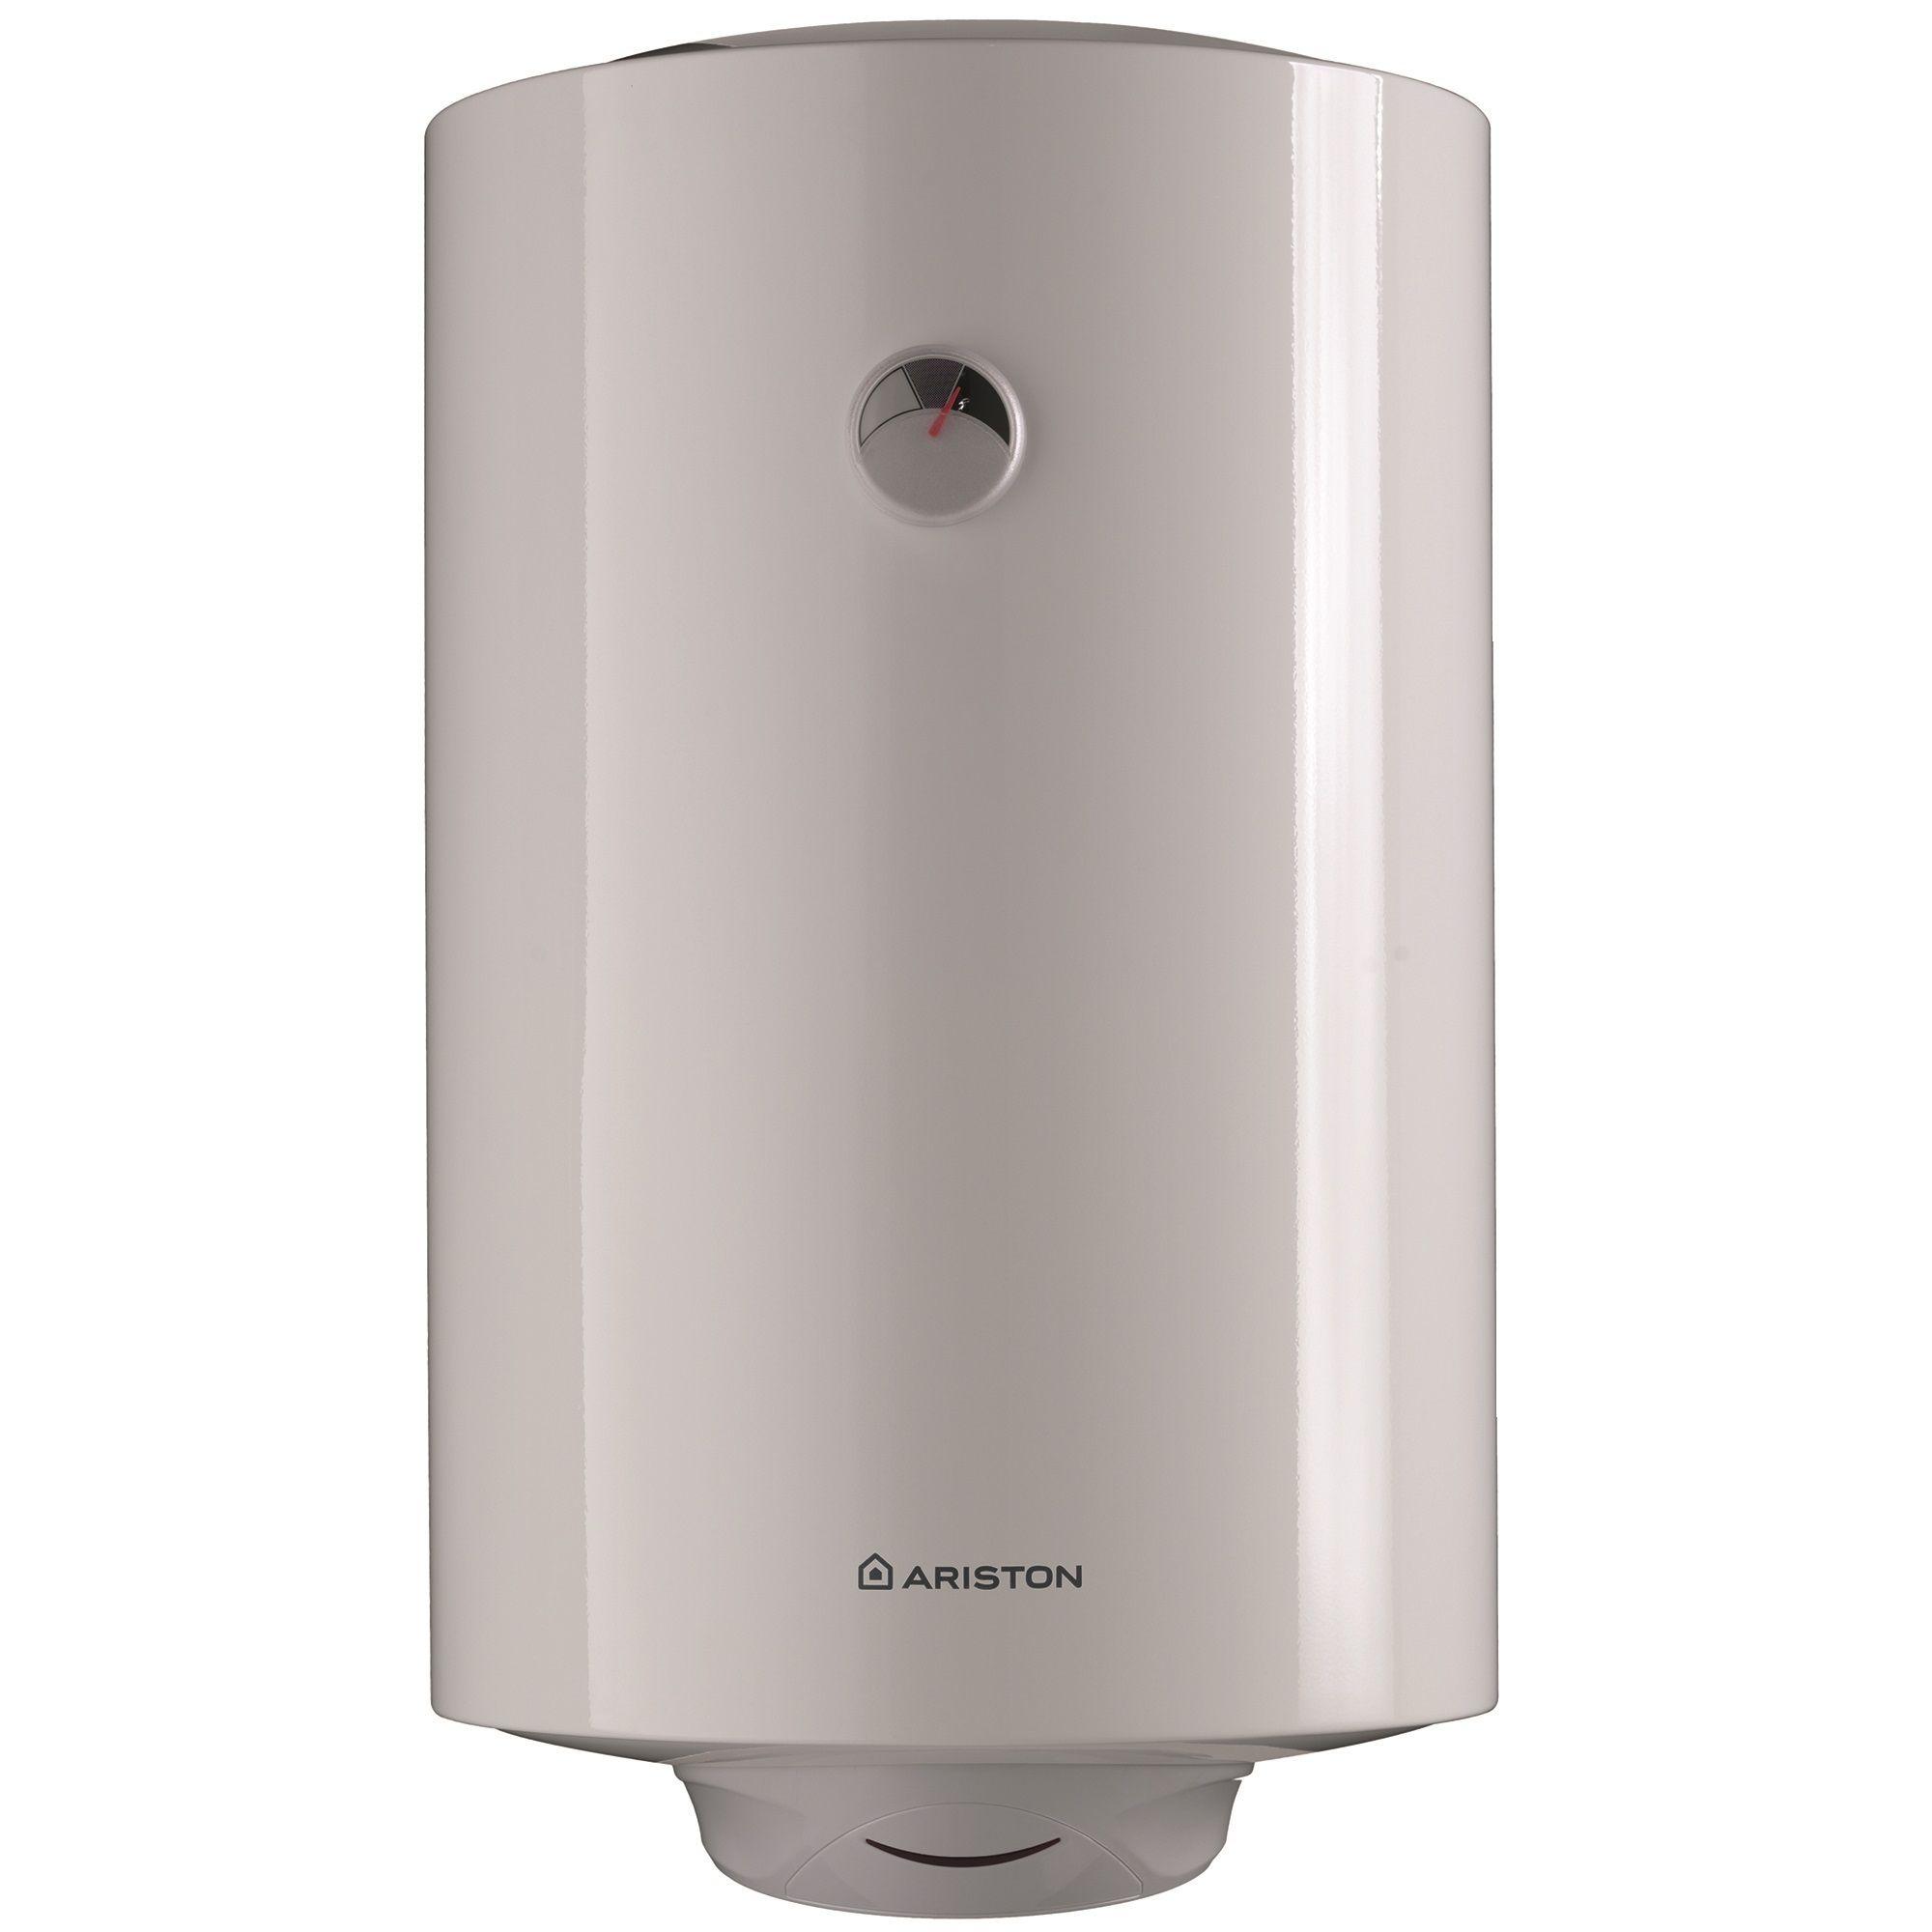 Boiler termoelectric Ariston Pro R VTS 120 EU, 2000 W, 120 l, 0.8 Mpa, Serpentina pe partea stanga, Izolatie termica, Protectie electrica IPX4, Reglaj extern de temperatura imagine fornello.ro